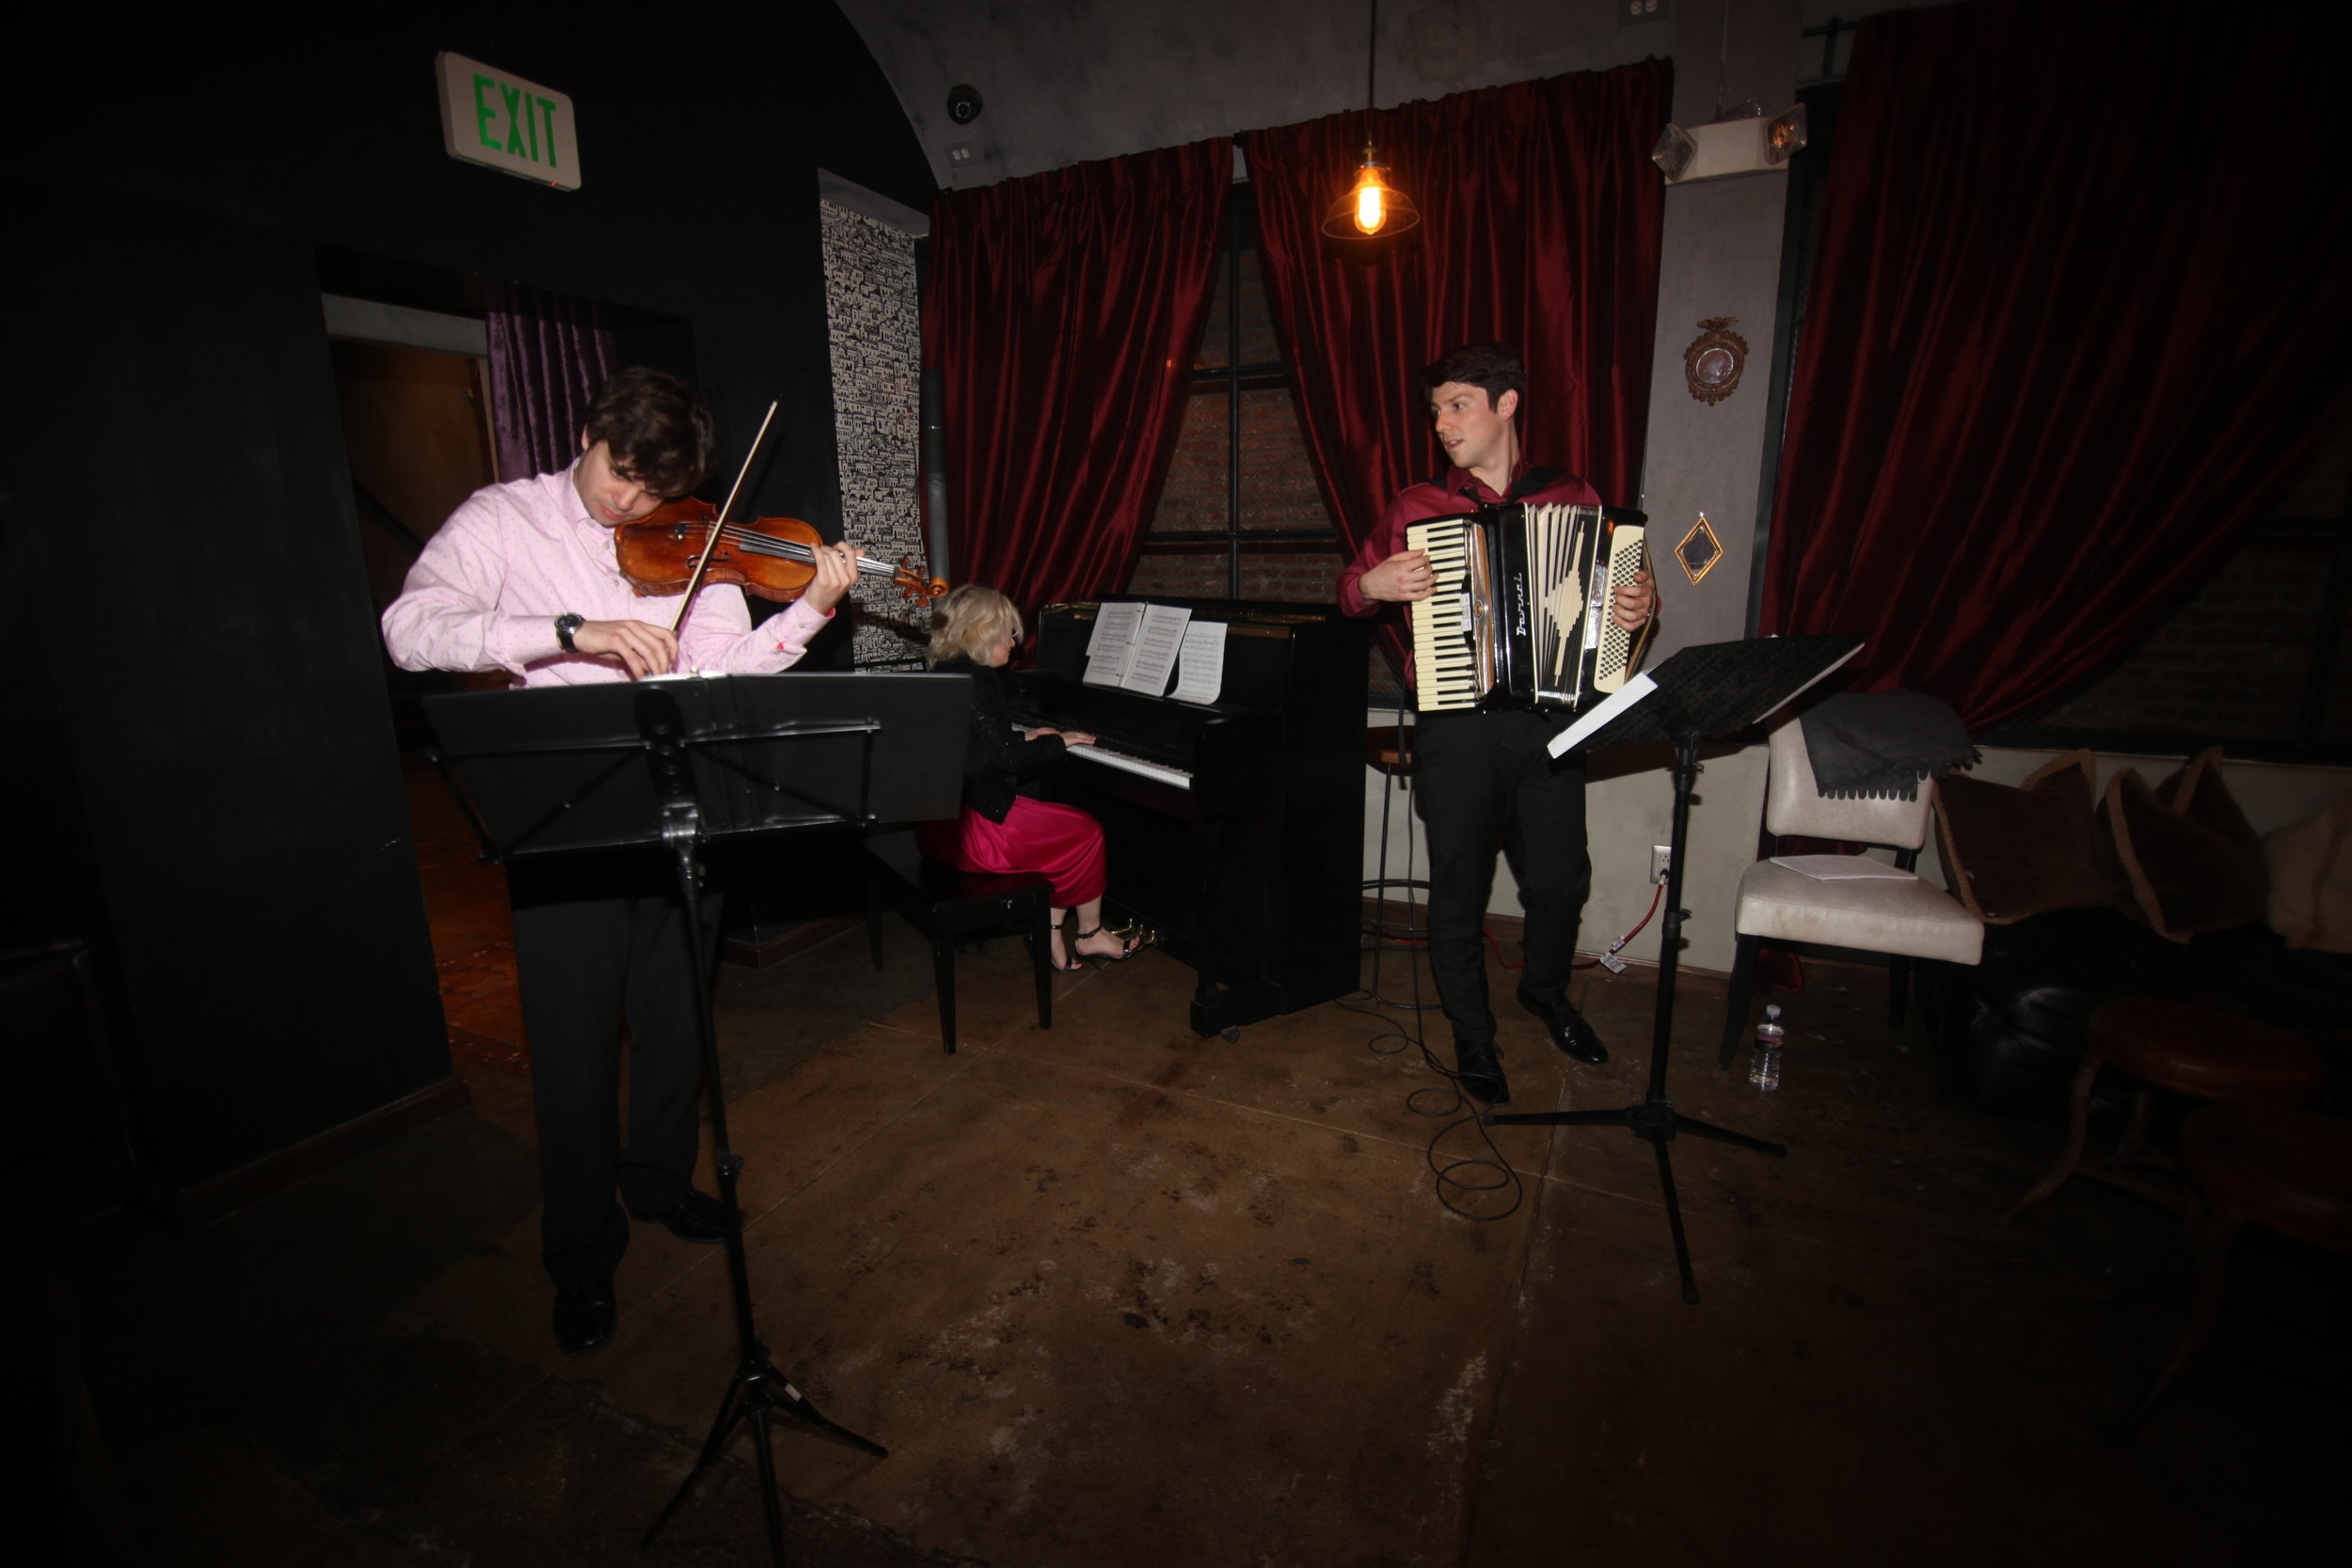 Tango_Trio_Music_And_Wine_Tasting_Los_Angeles.jpg